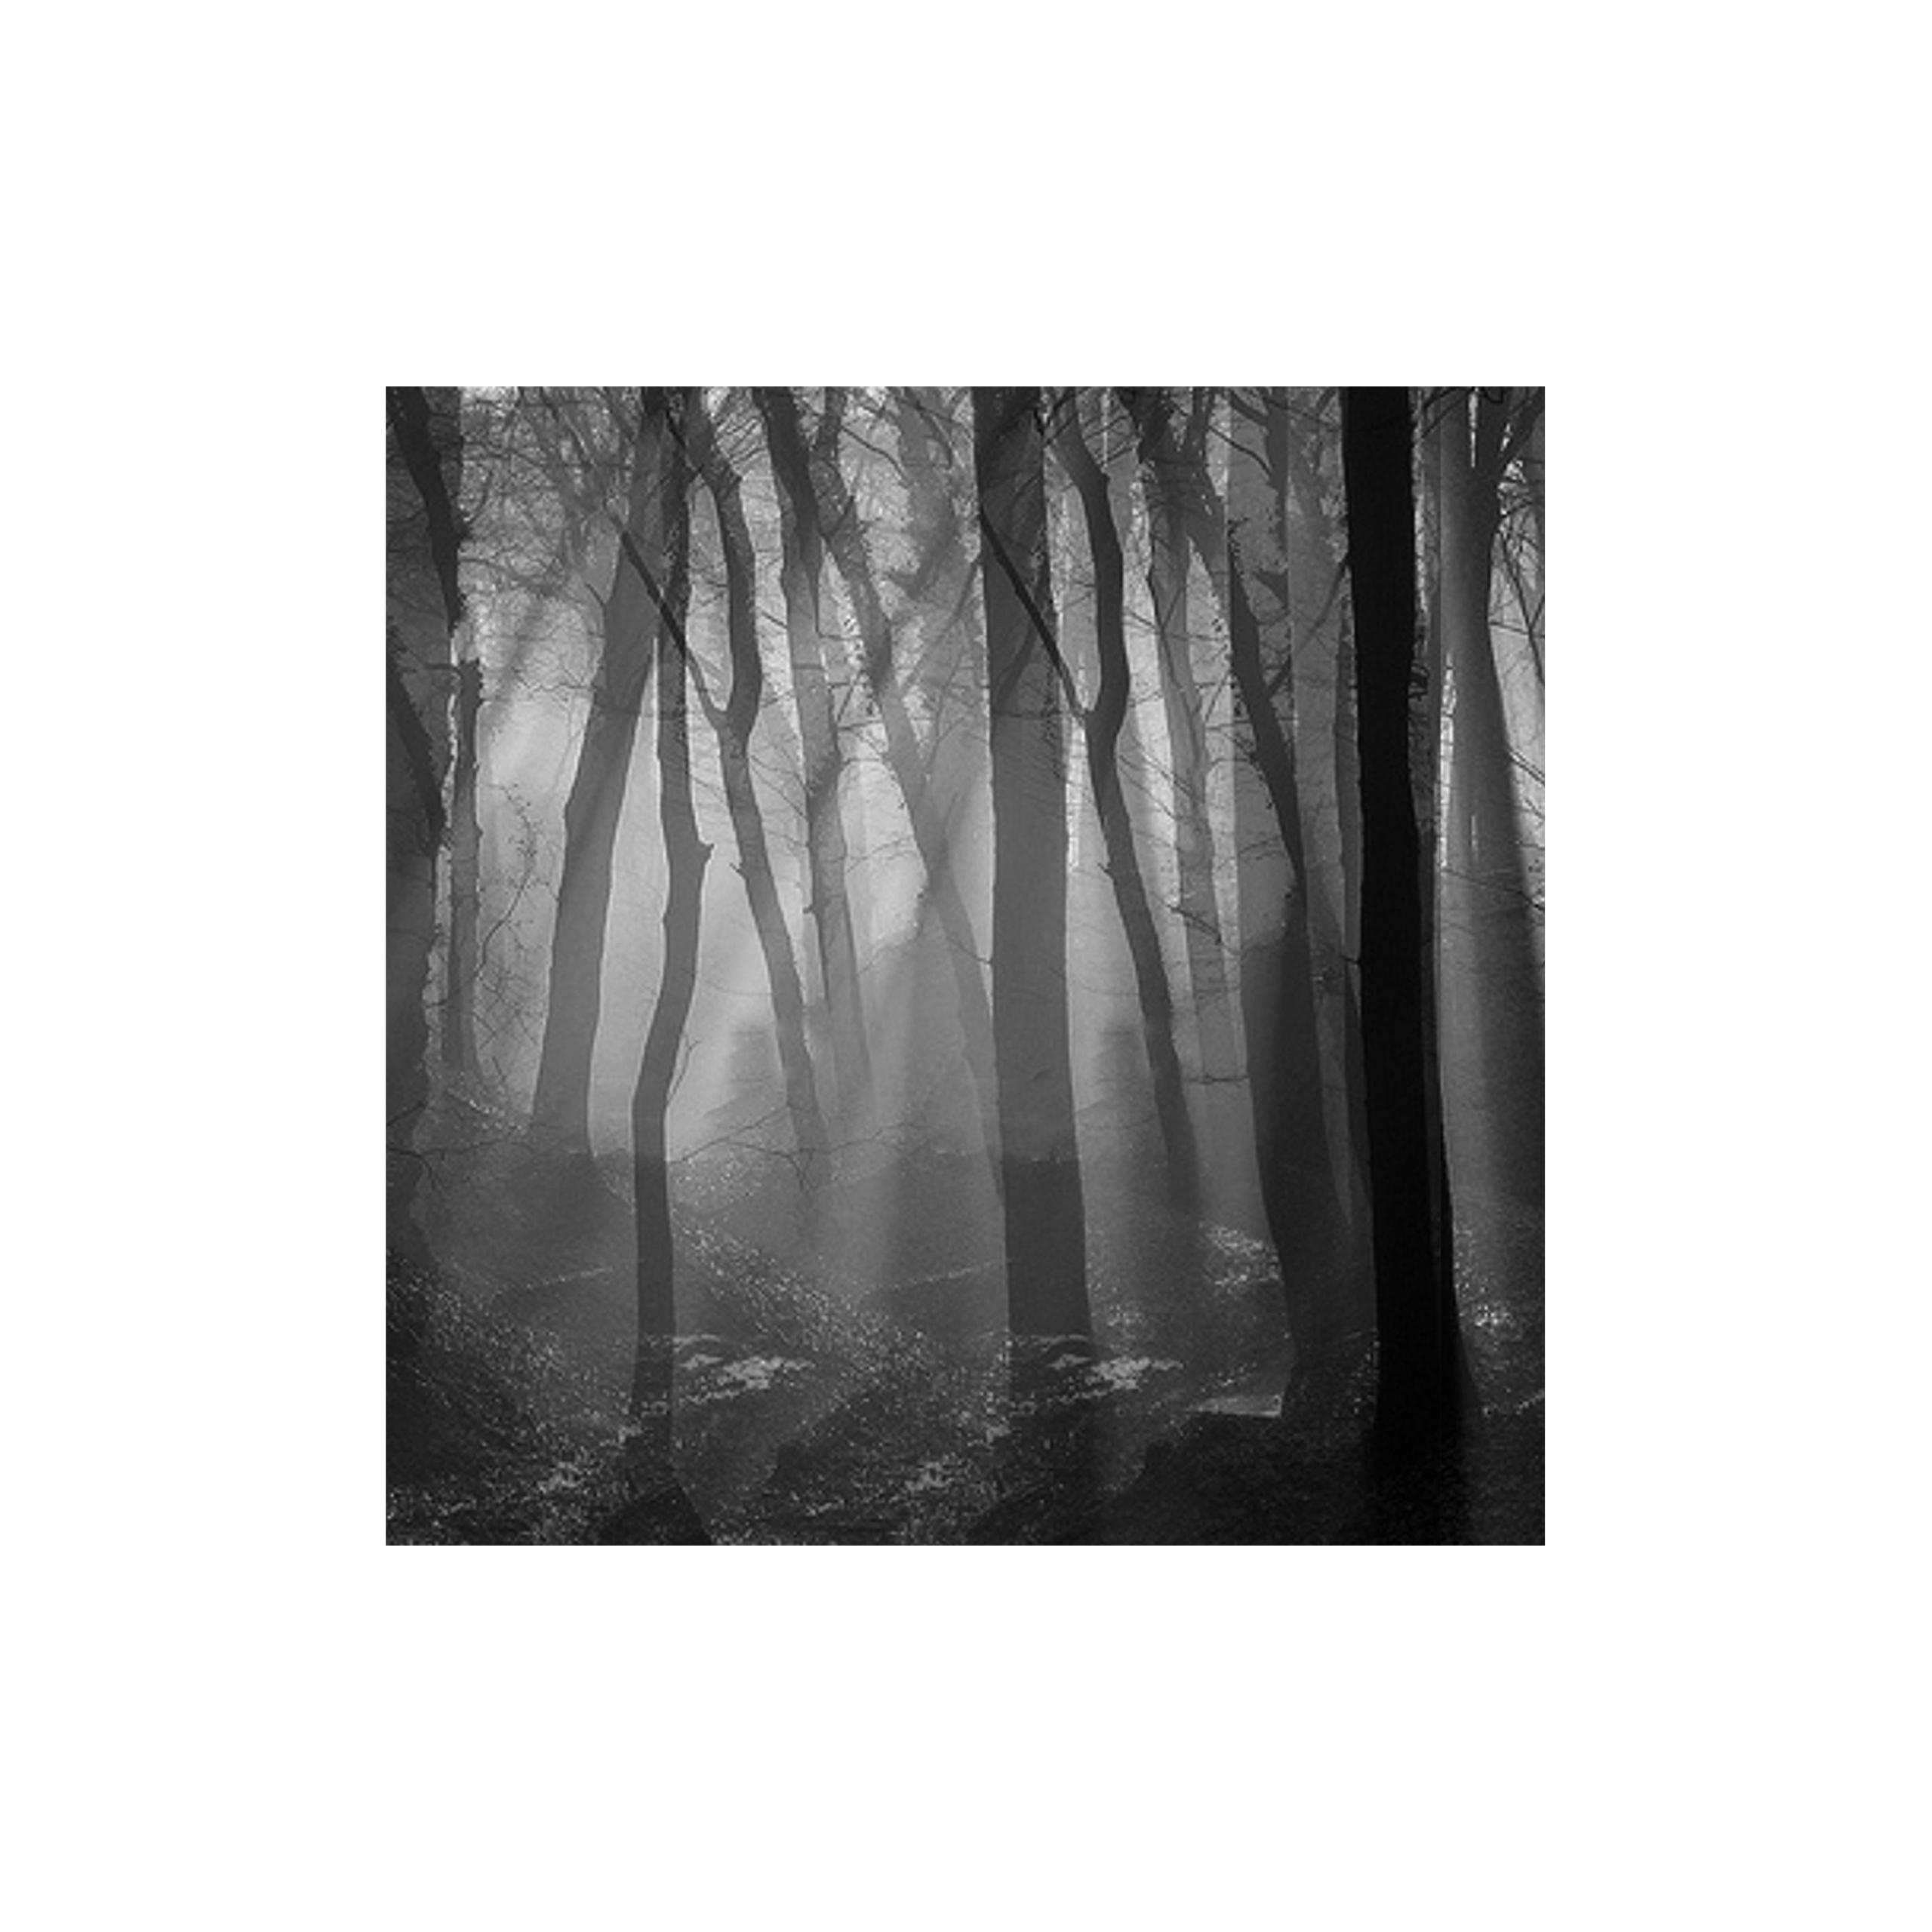 monique2211 Post 14 Oct 2018 16:46:00 UTC | ello